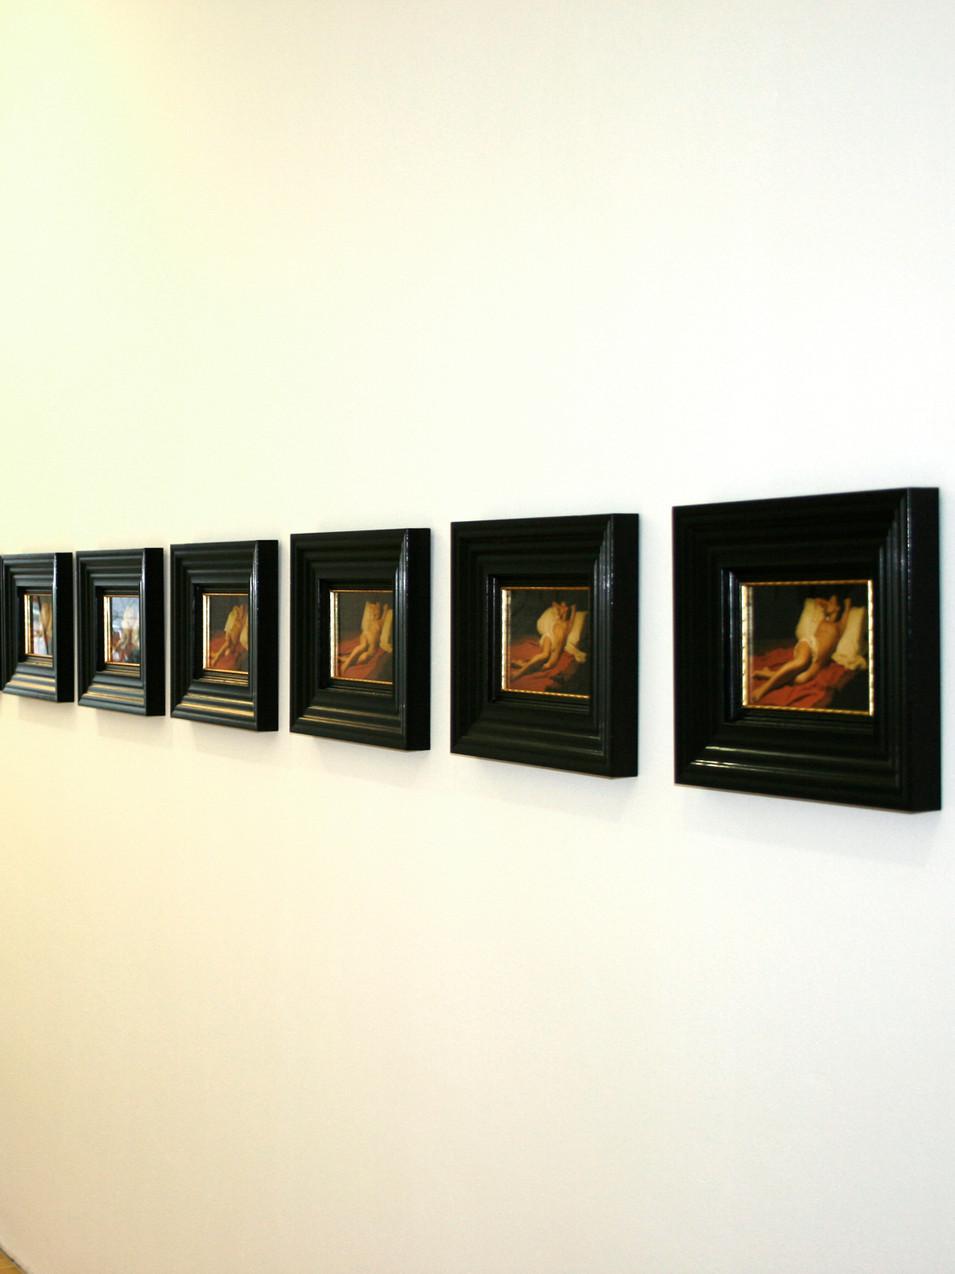 Anna Herrgott | Feat. Rubens | Ausstellungsansicht